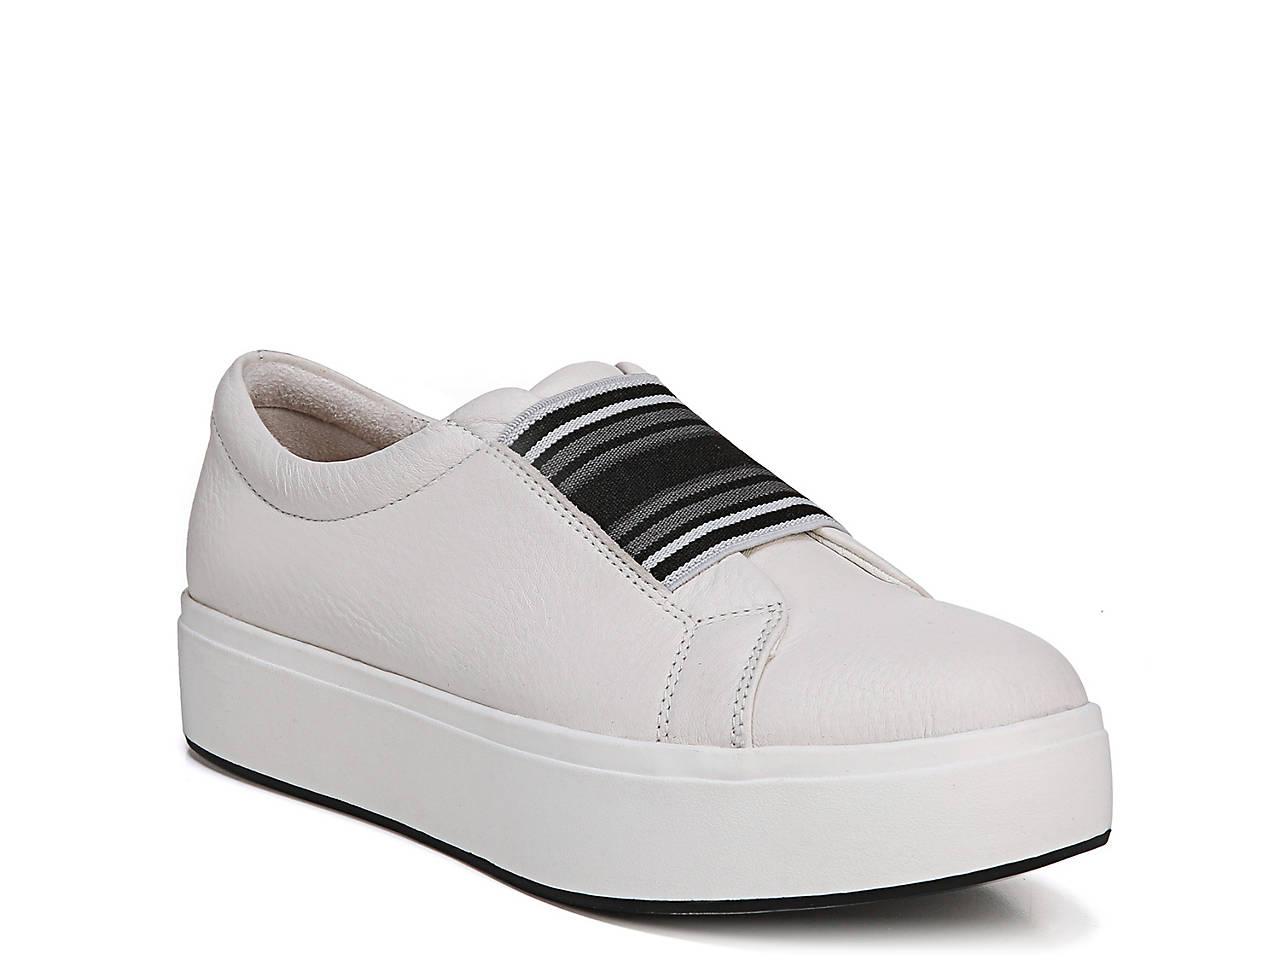 a65c867ded5 Dr. Scholl s Abbot Platform Slip-On Sneaker Women s Shoes